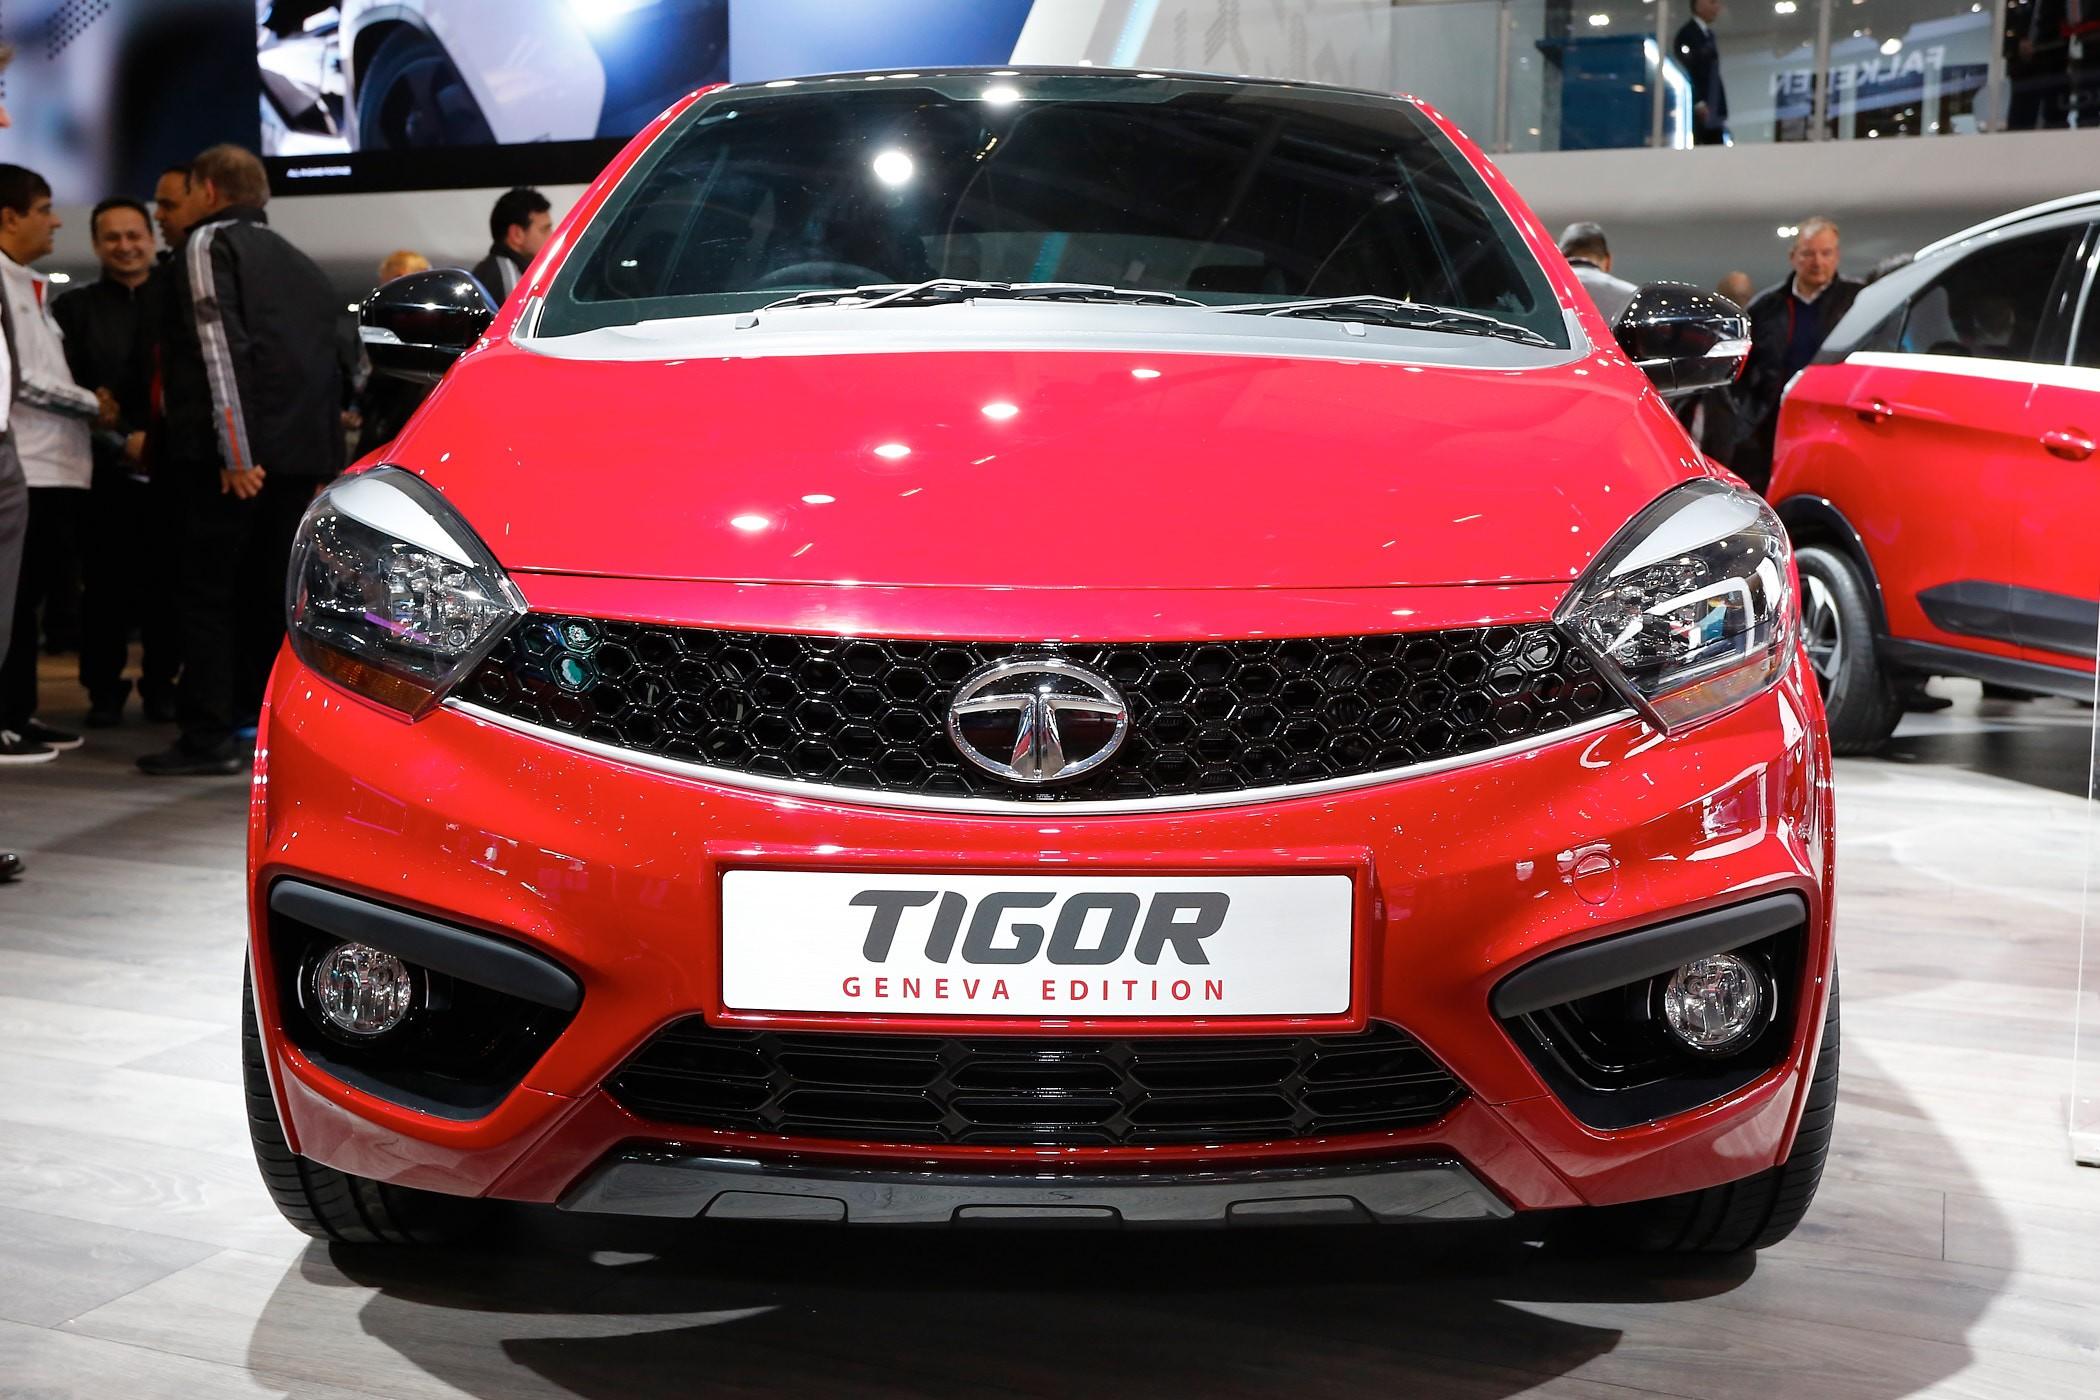 tata tigor unveiled in geneva its a subcompact model for